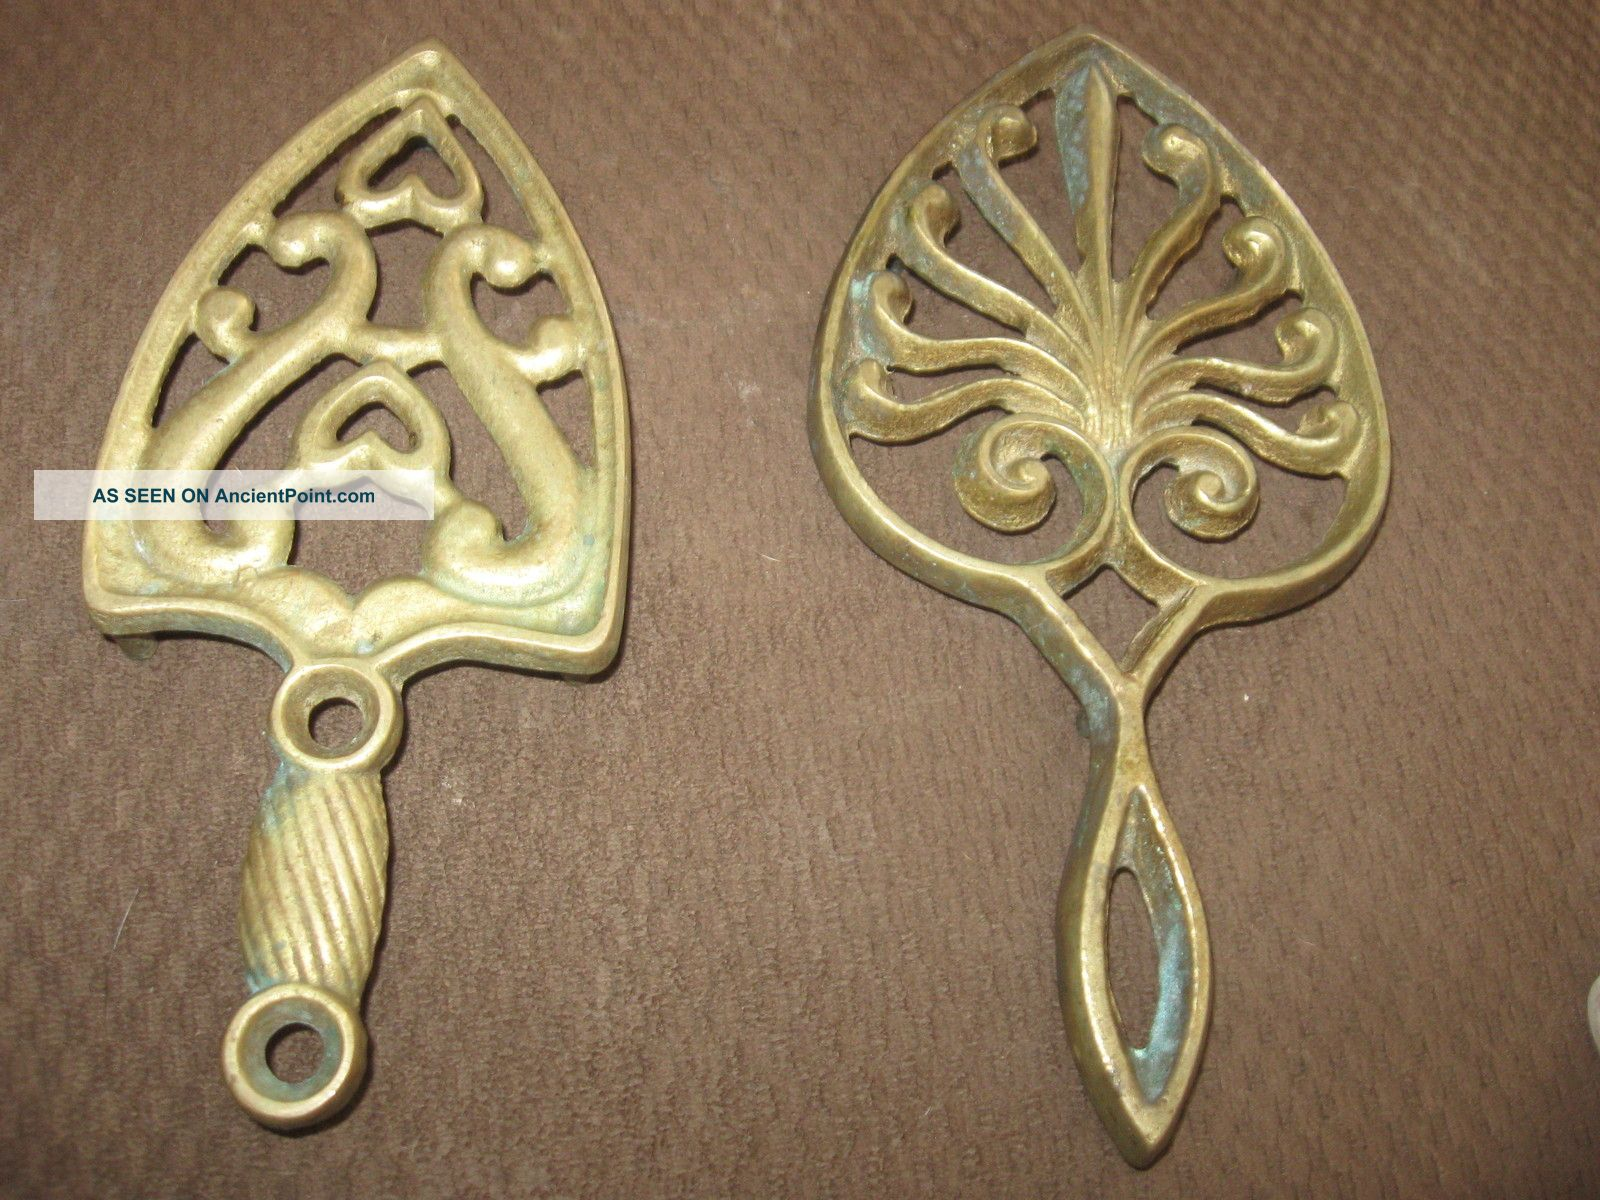 2 Vintage Cast Brass Trivet Hot Plate Iron Trivets photo